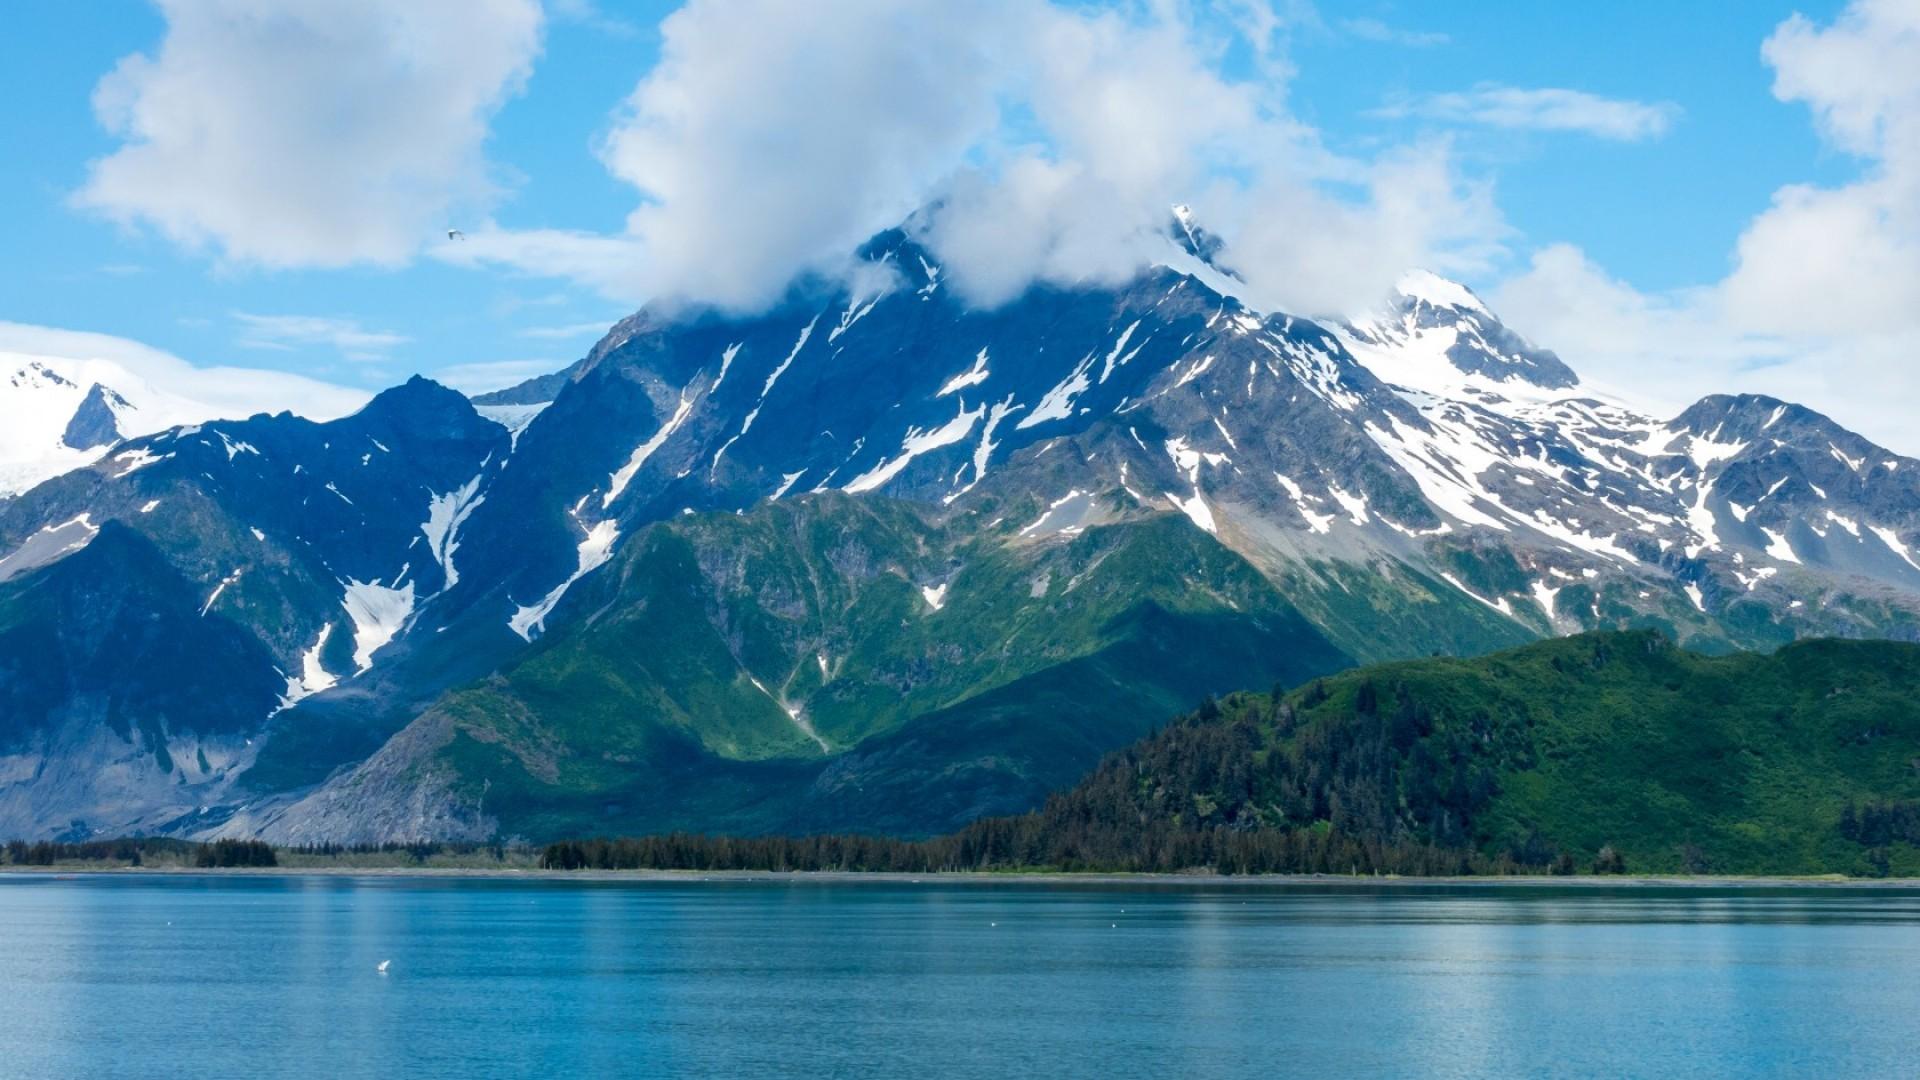 Filename: Alaska-Wallpaper-Mobile-Compatible.jpg